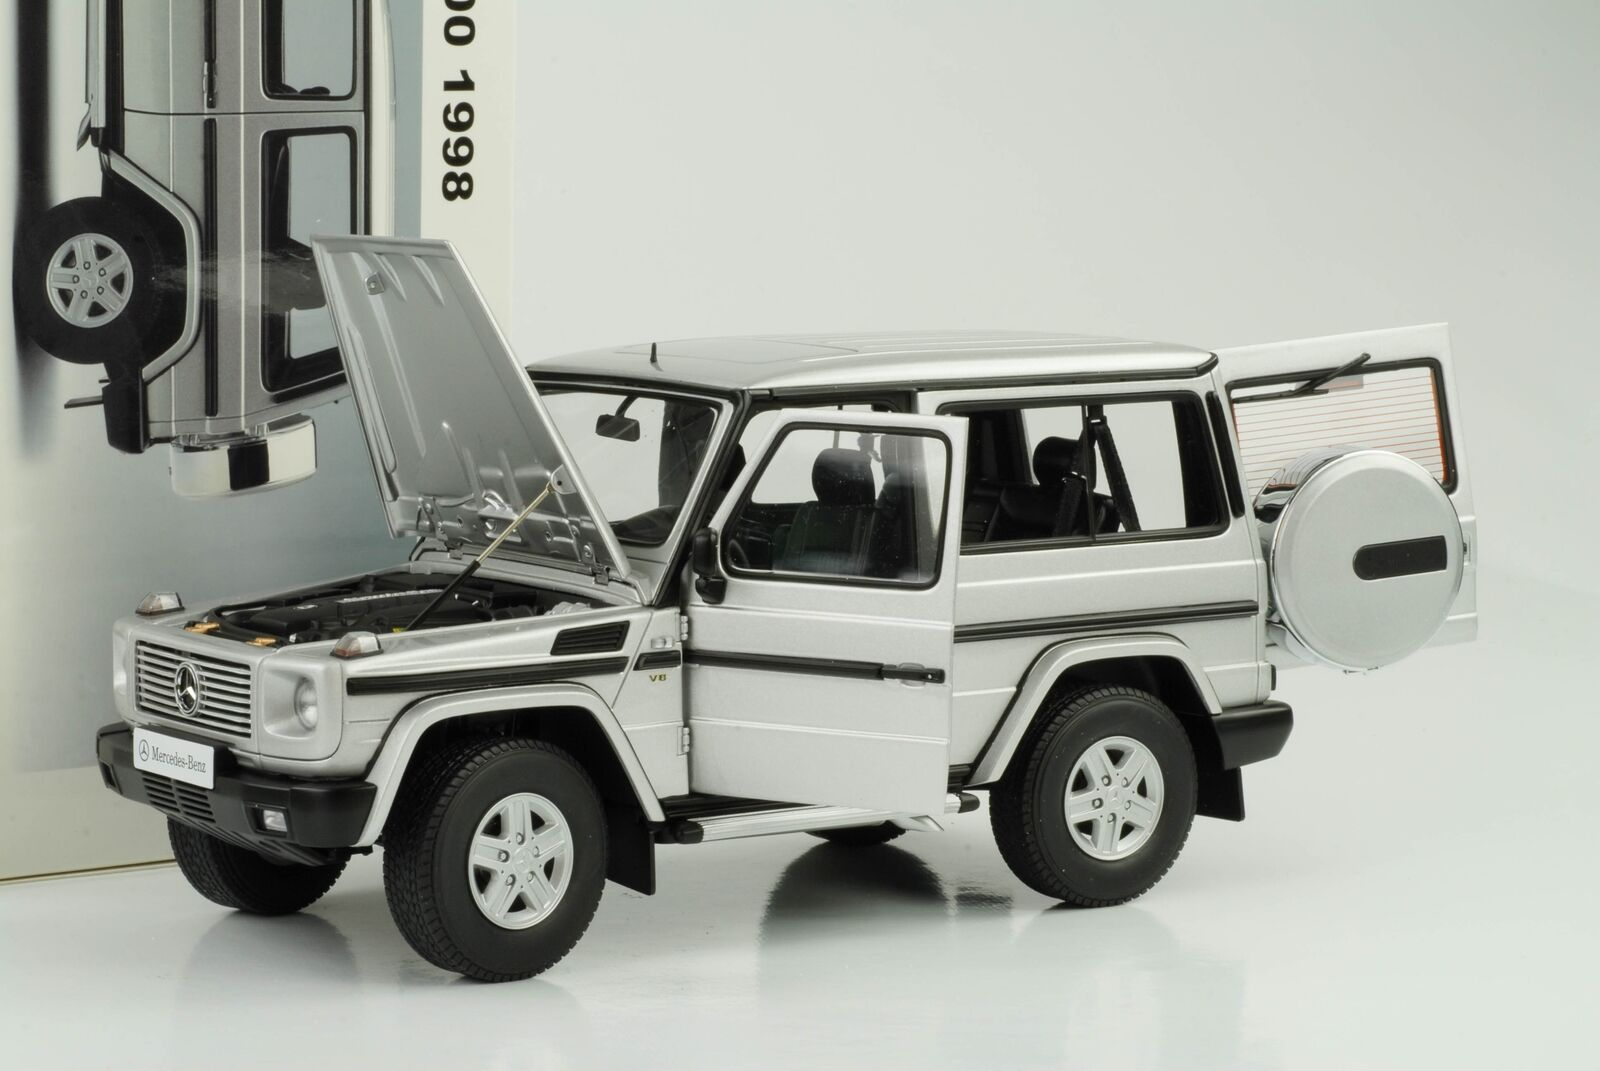 Mejor precio 1 18 mercedes-benz g500 g g g 500 G-class 1998 SWB plata Autoart 76112  ¡envío gratis!